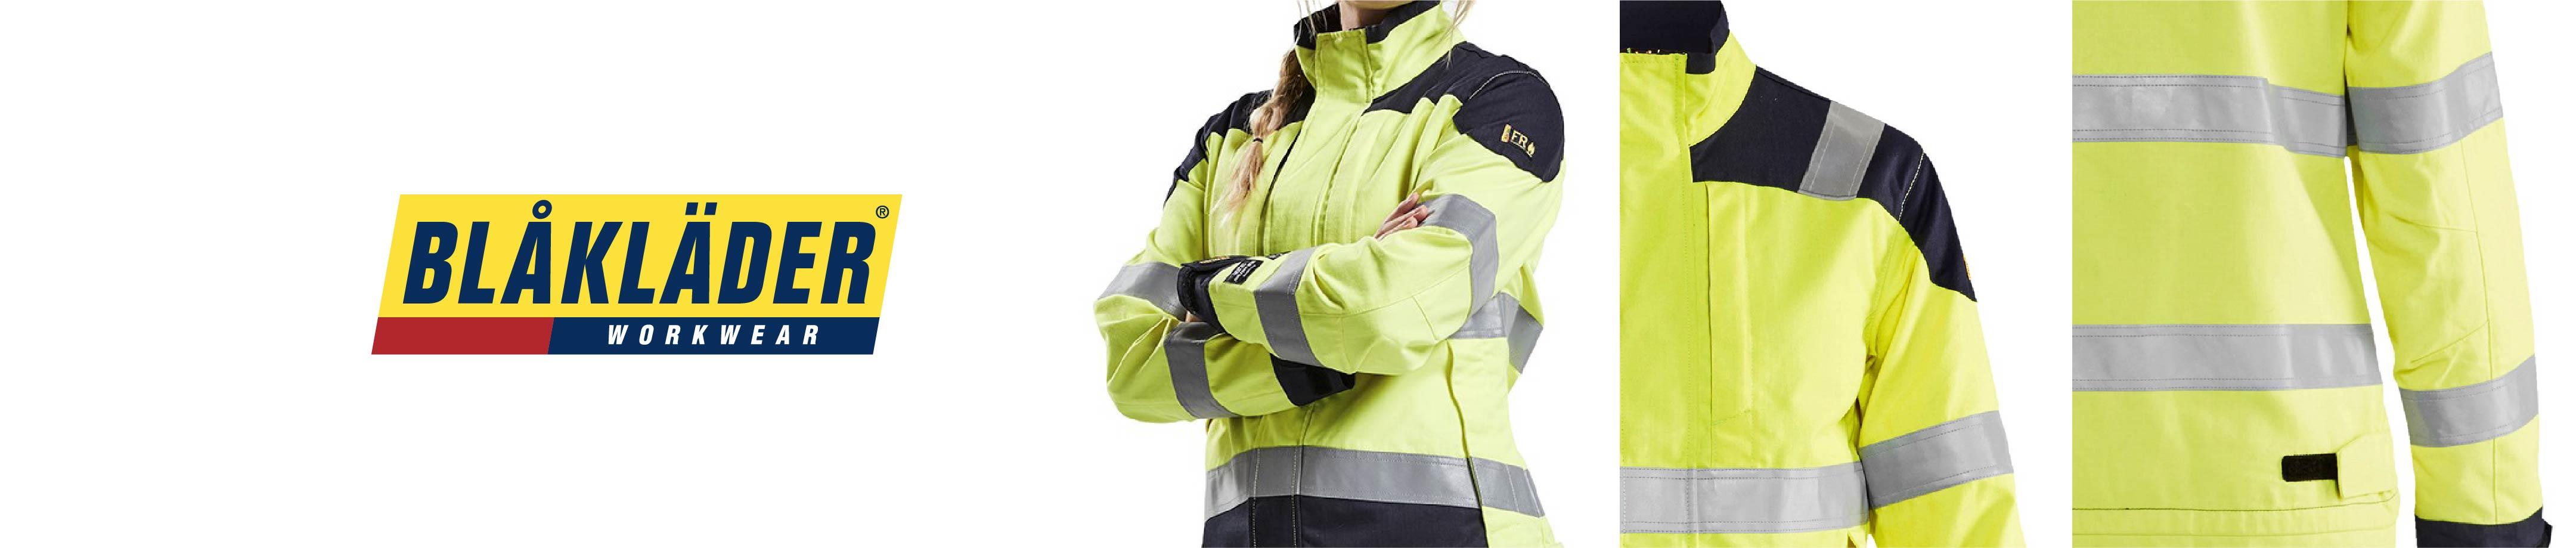 Flame retardant work jackets